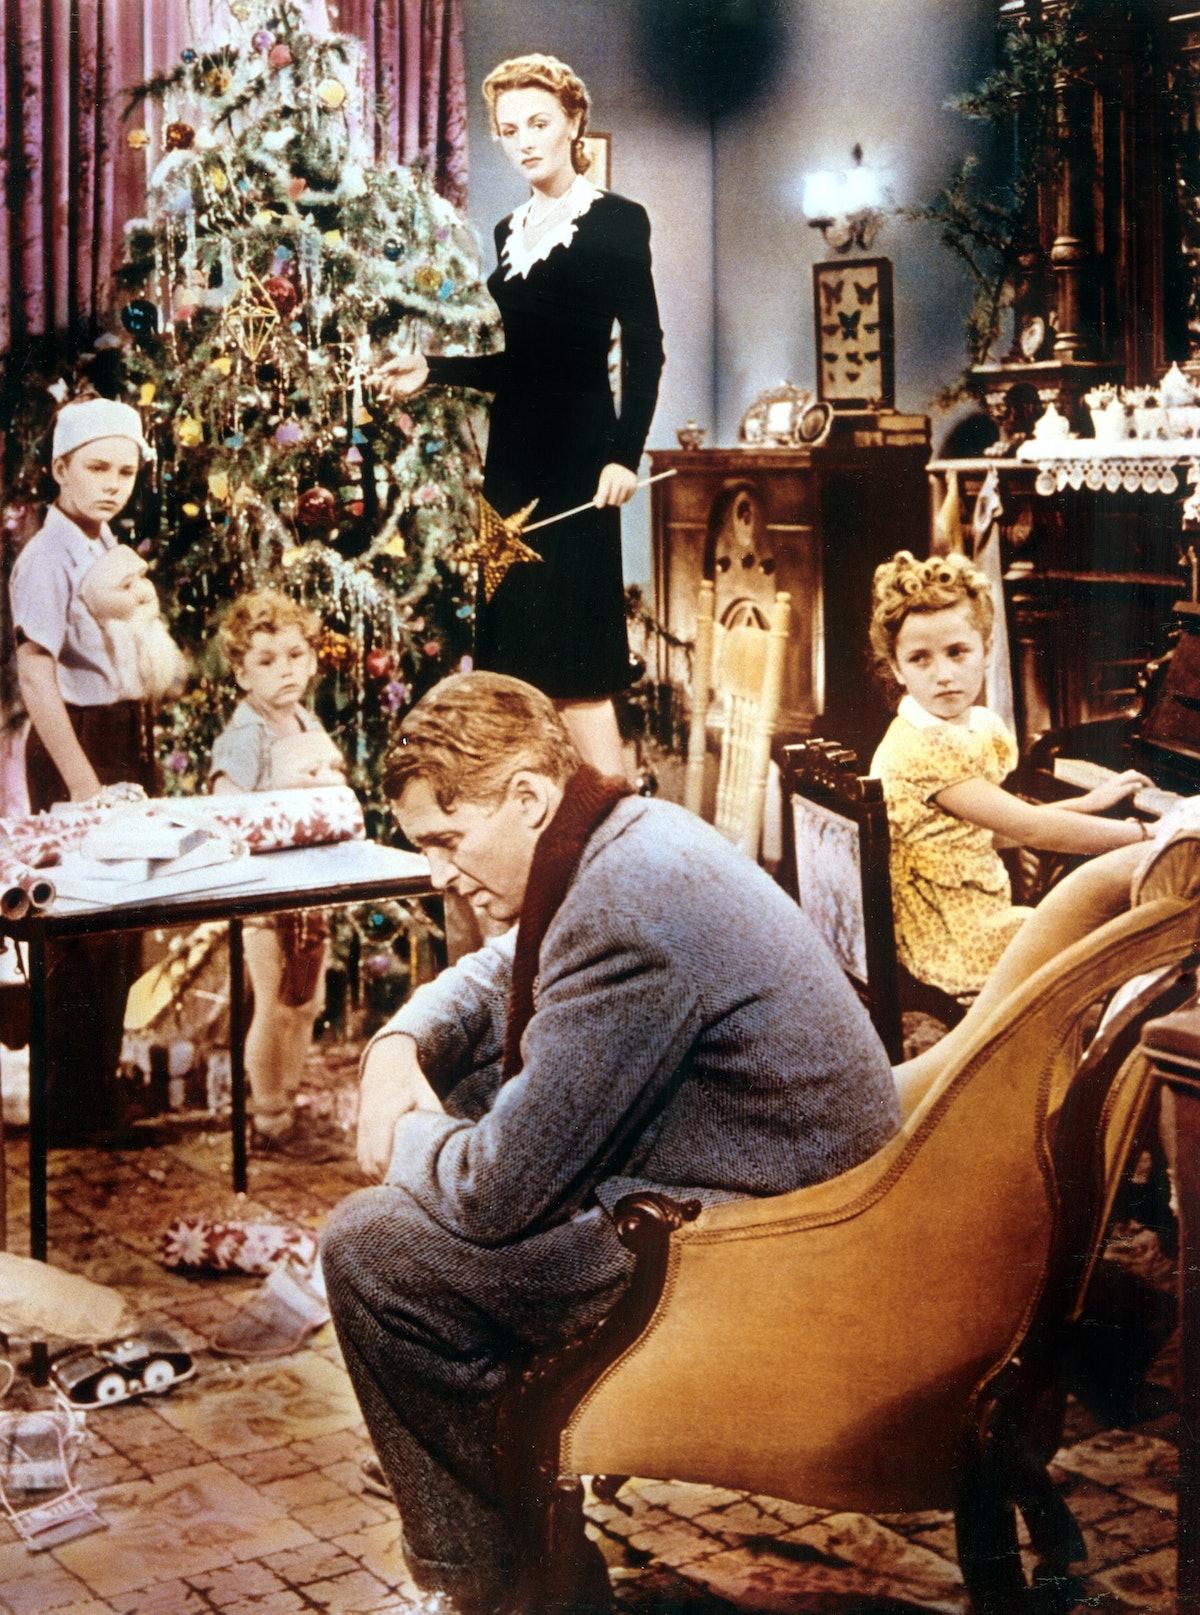 IT'S A WONDERFUL LIFE, Larry Simms, Jimmy Hawkins, Donna Reed, Karolyn Grimes, James Stewart, 1946